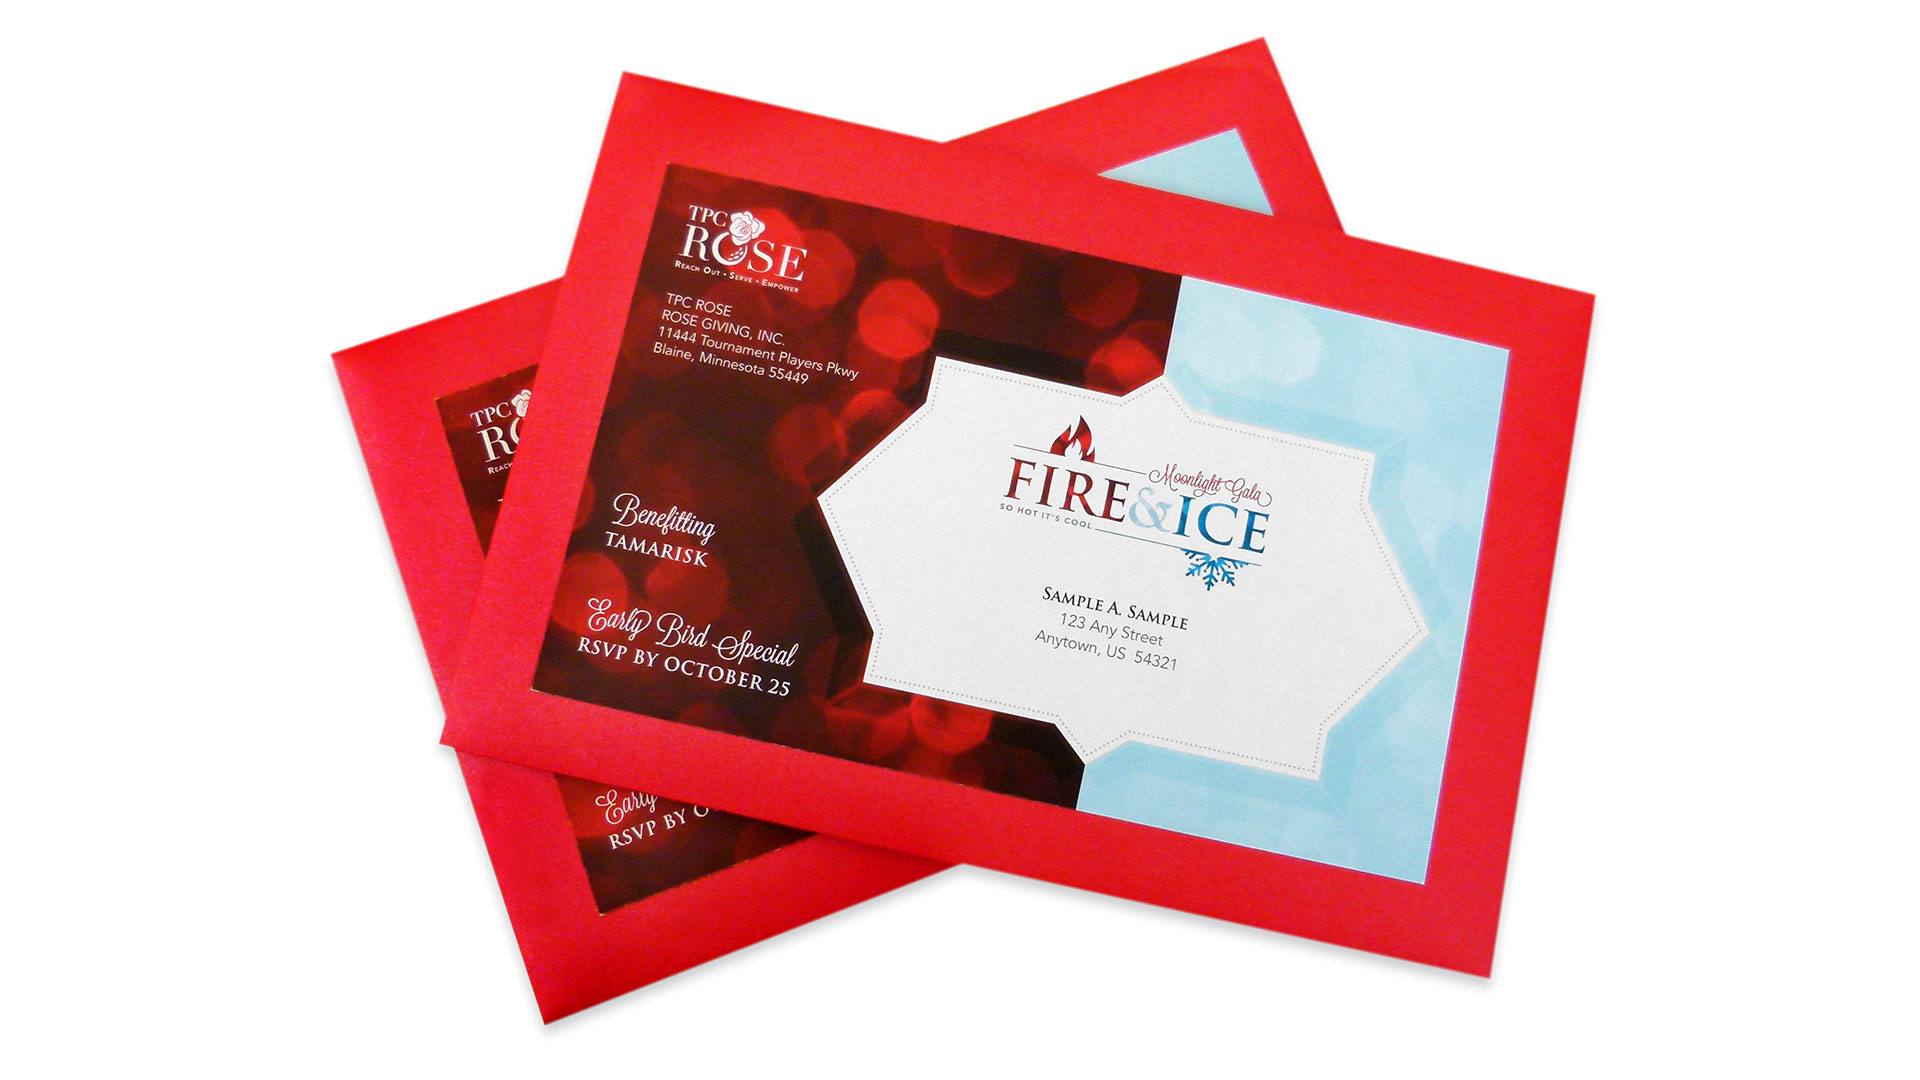 TPC ROSE Fire & Ice Moonlight Gala Invitation - PaperSpecs